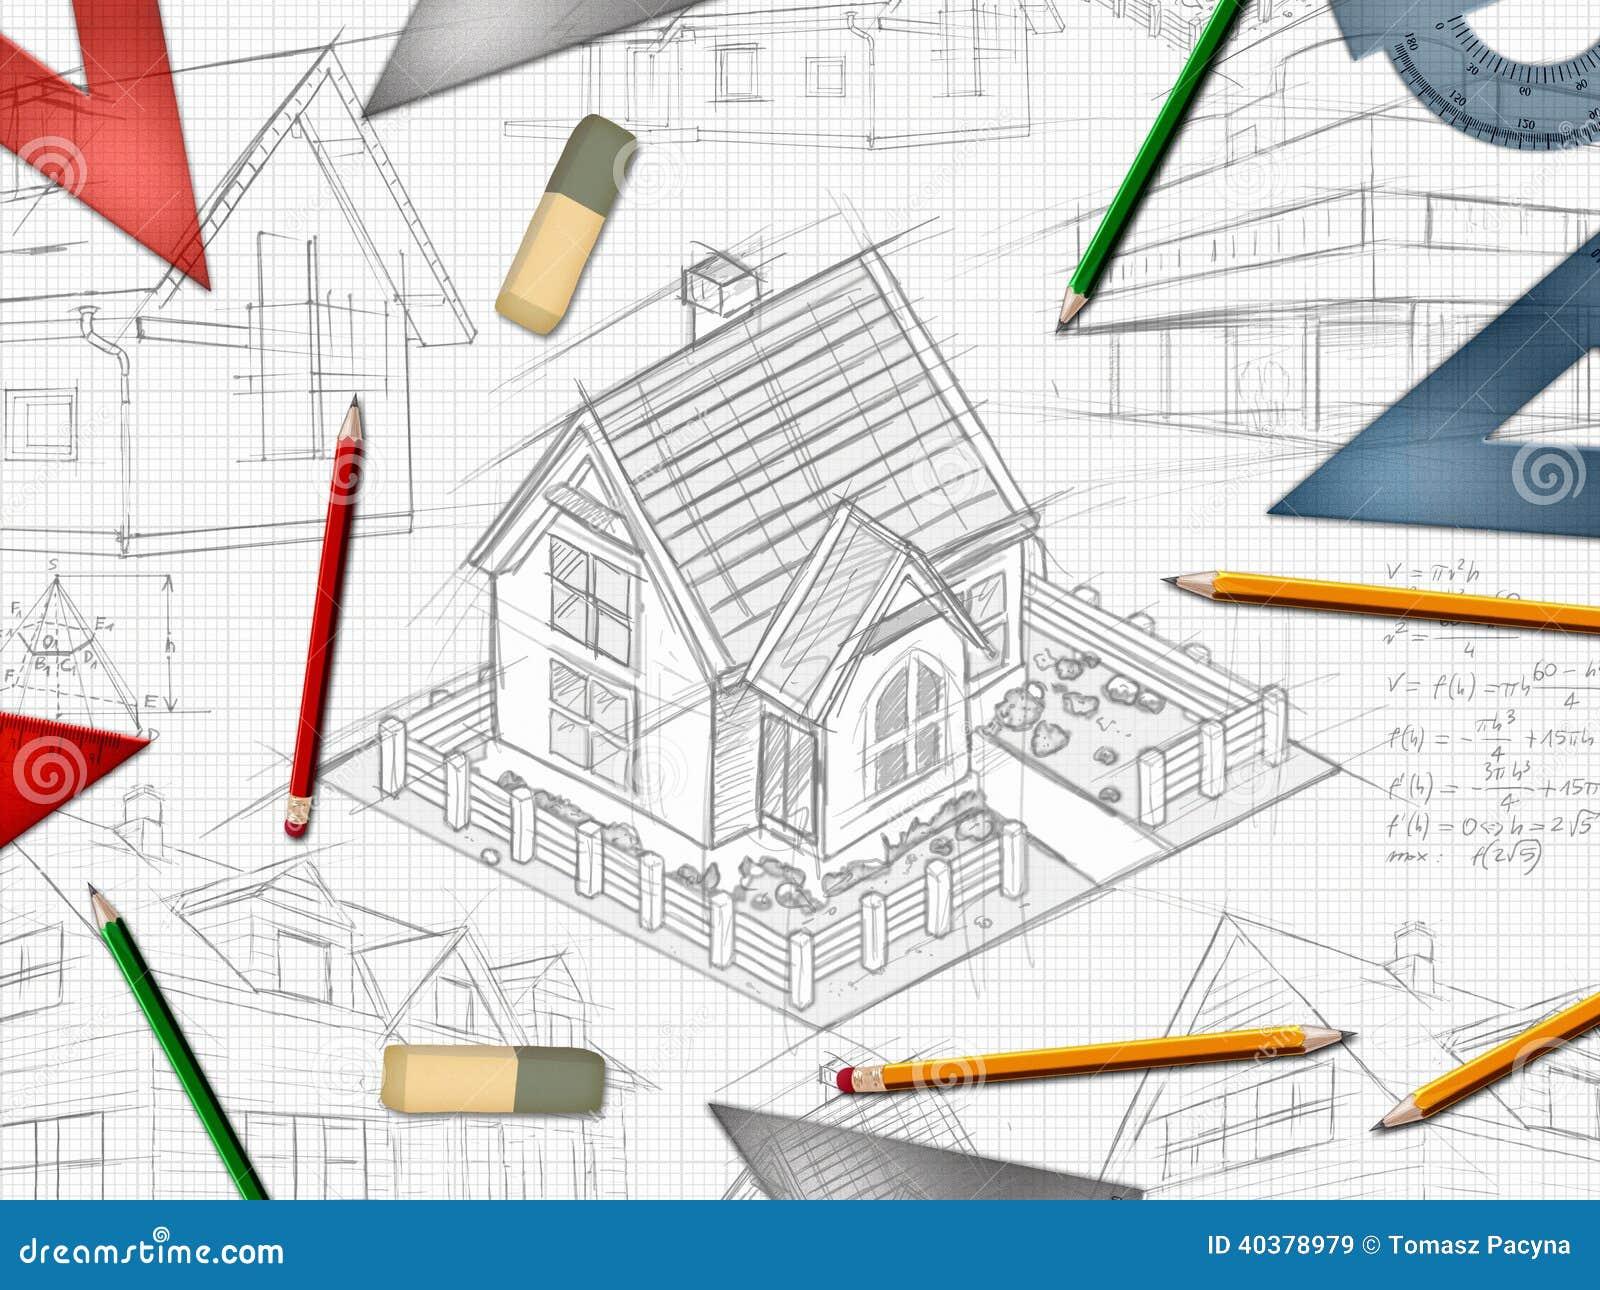 Architecture Design Background architect designer desktop background stock illustration - image